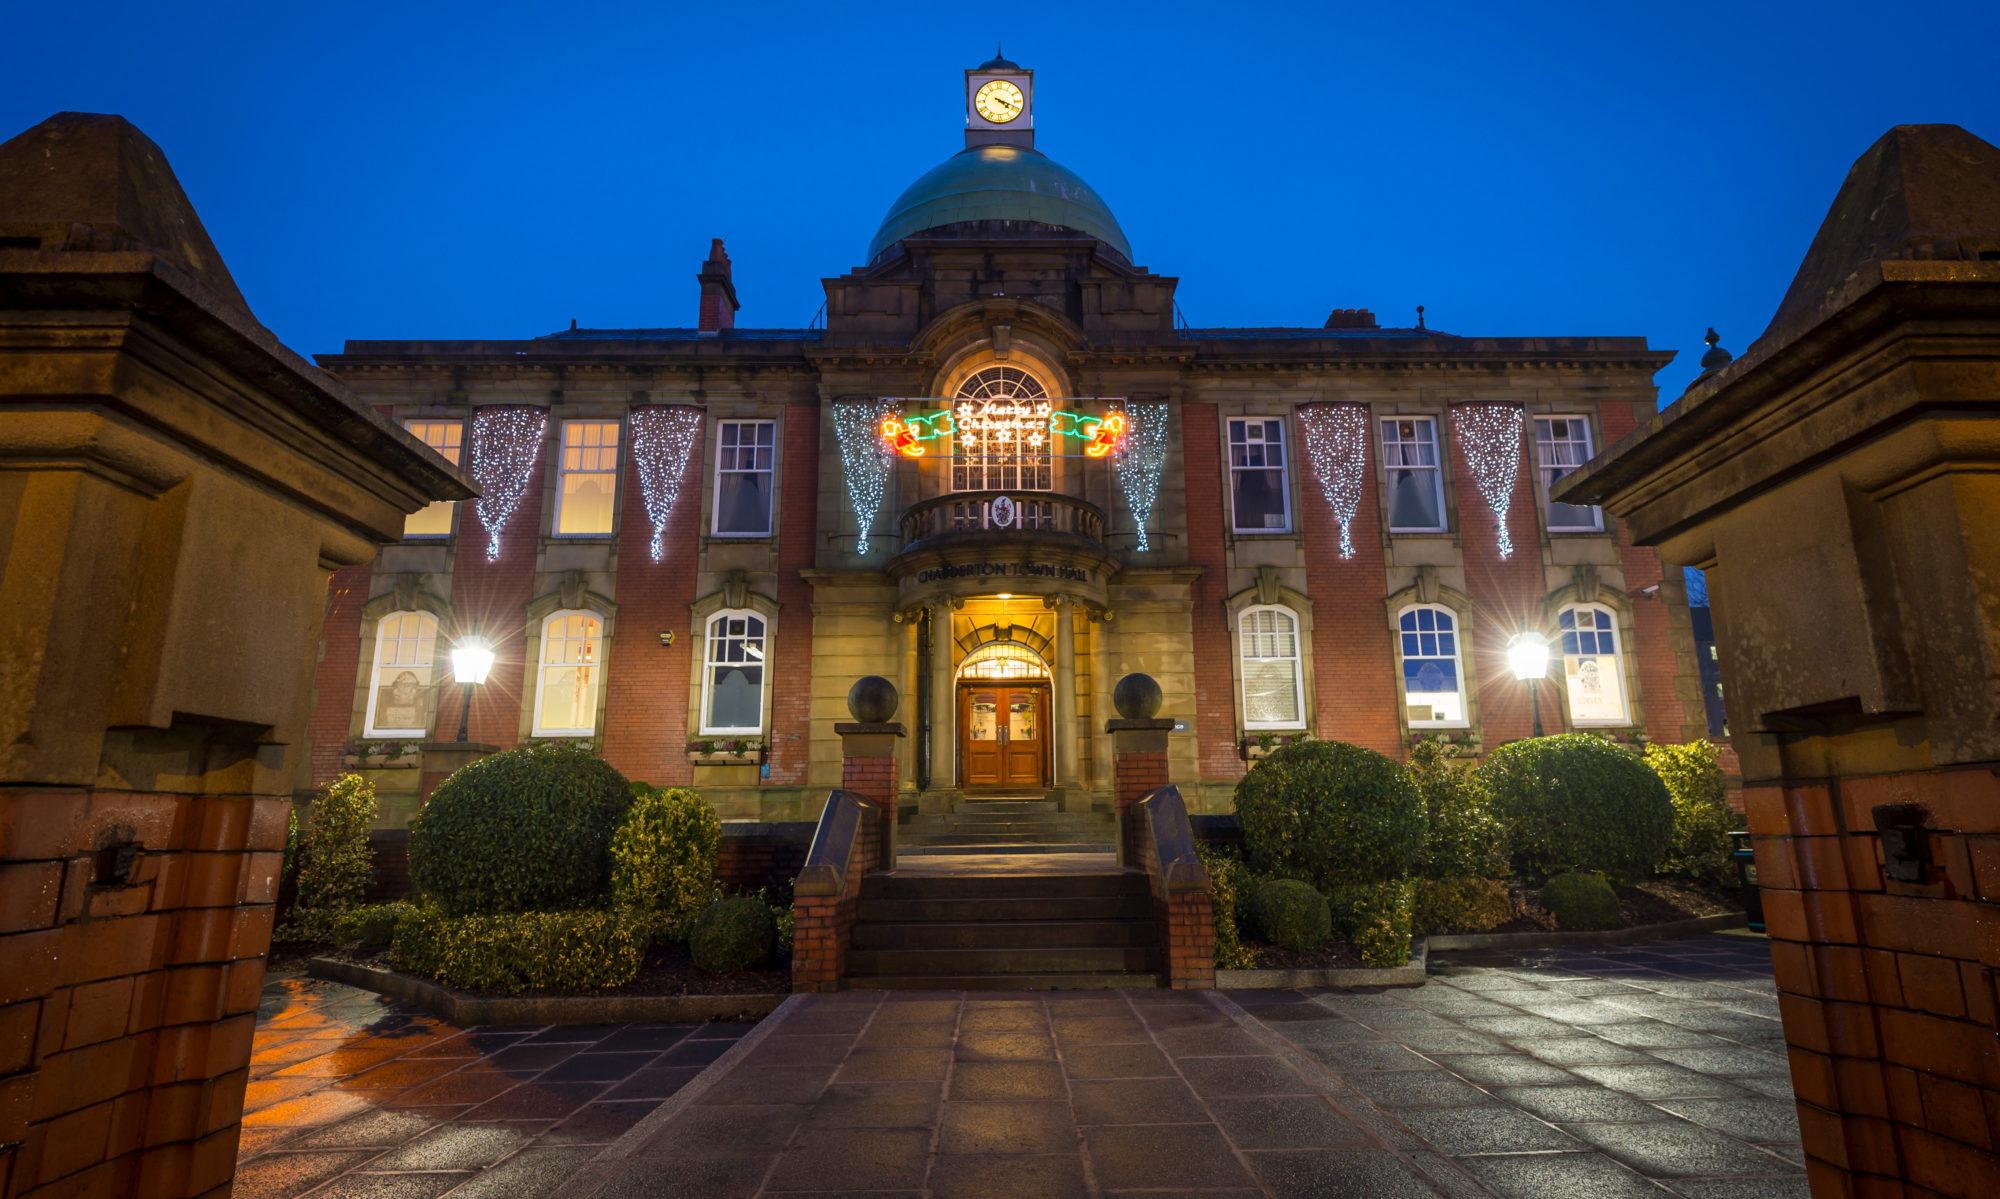 Chadderton Town Hall